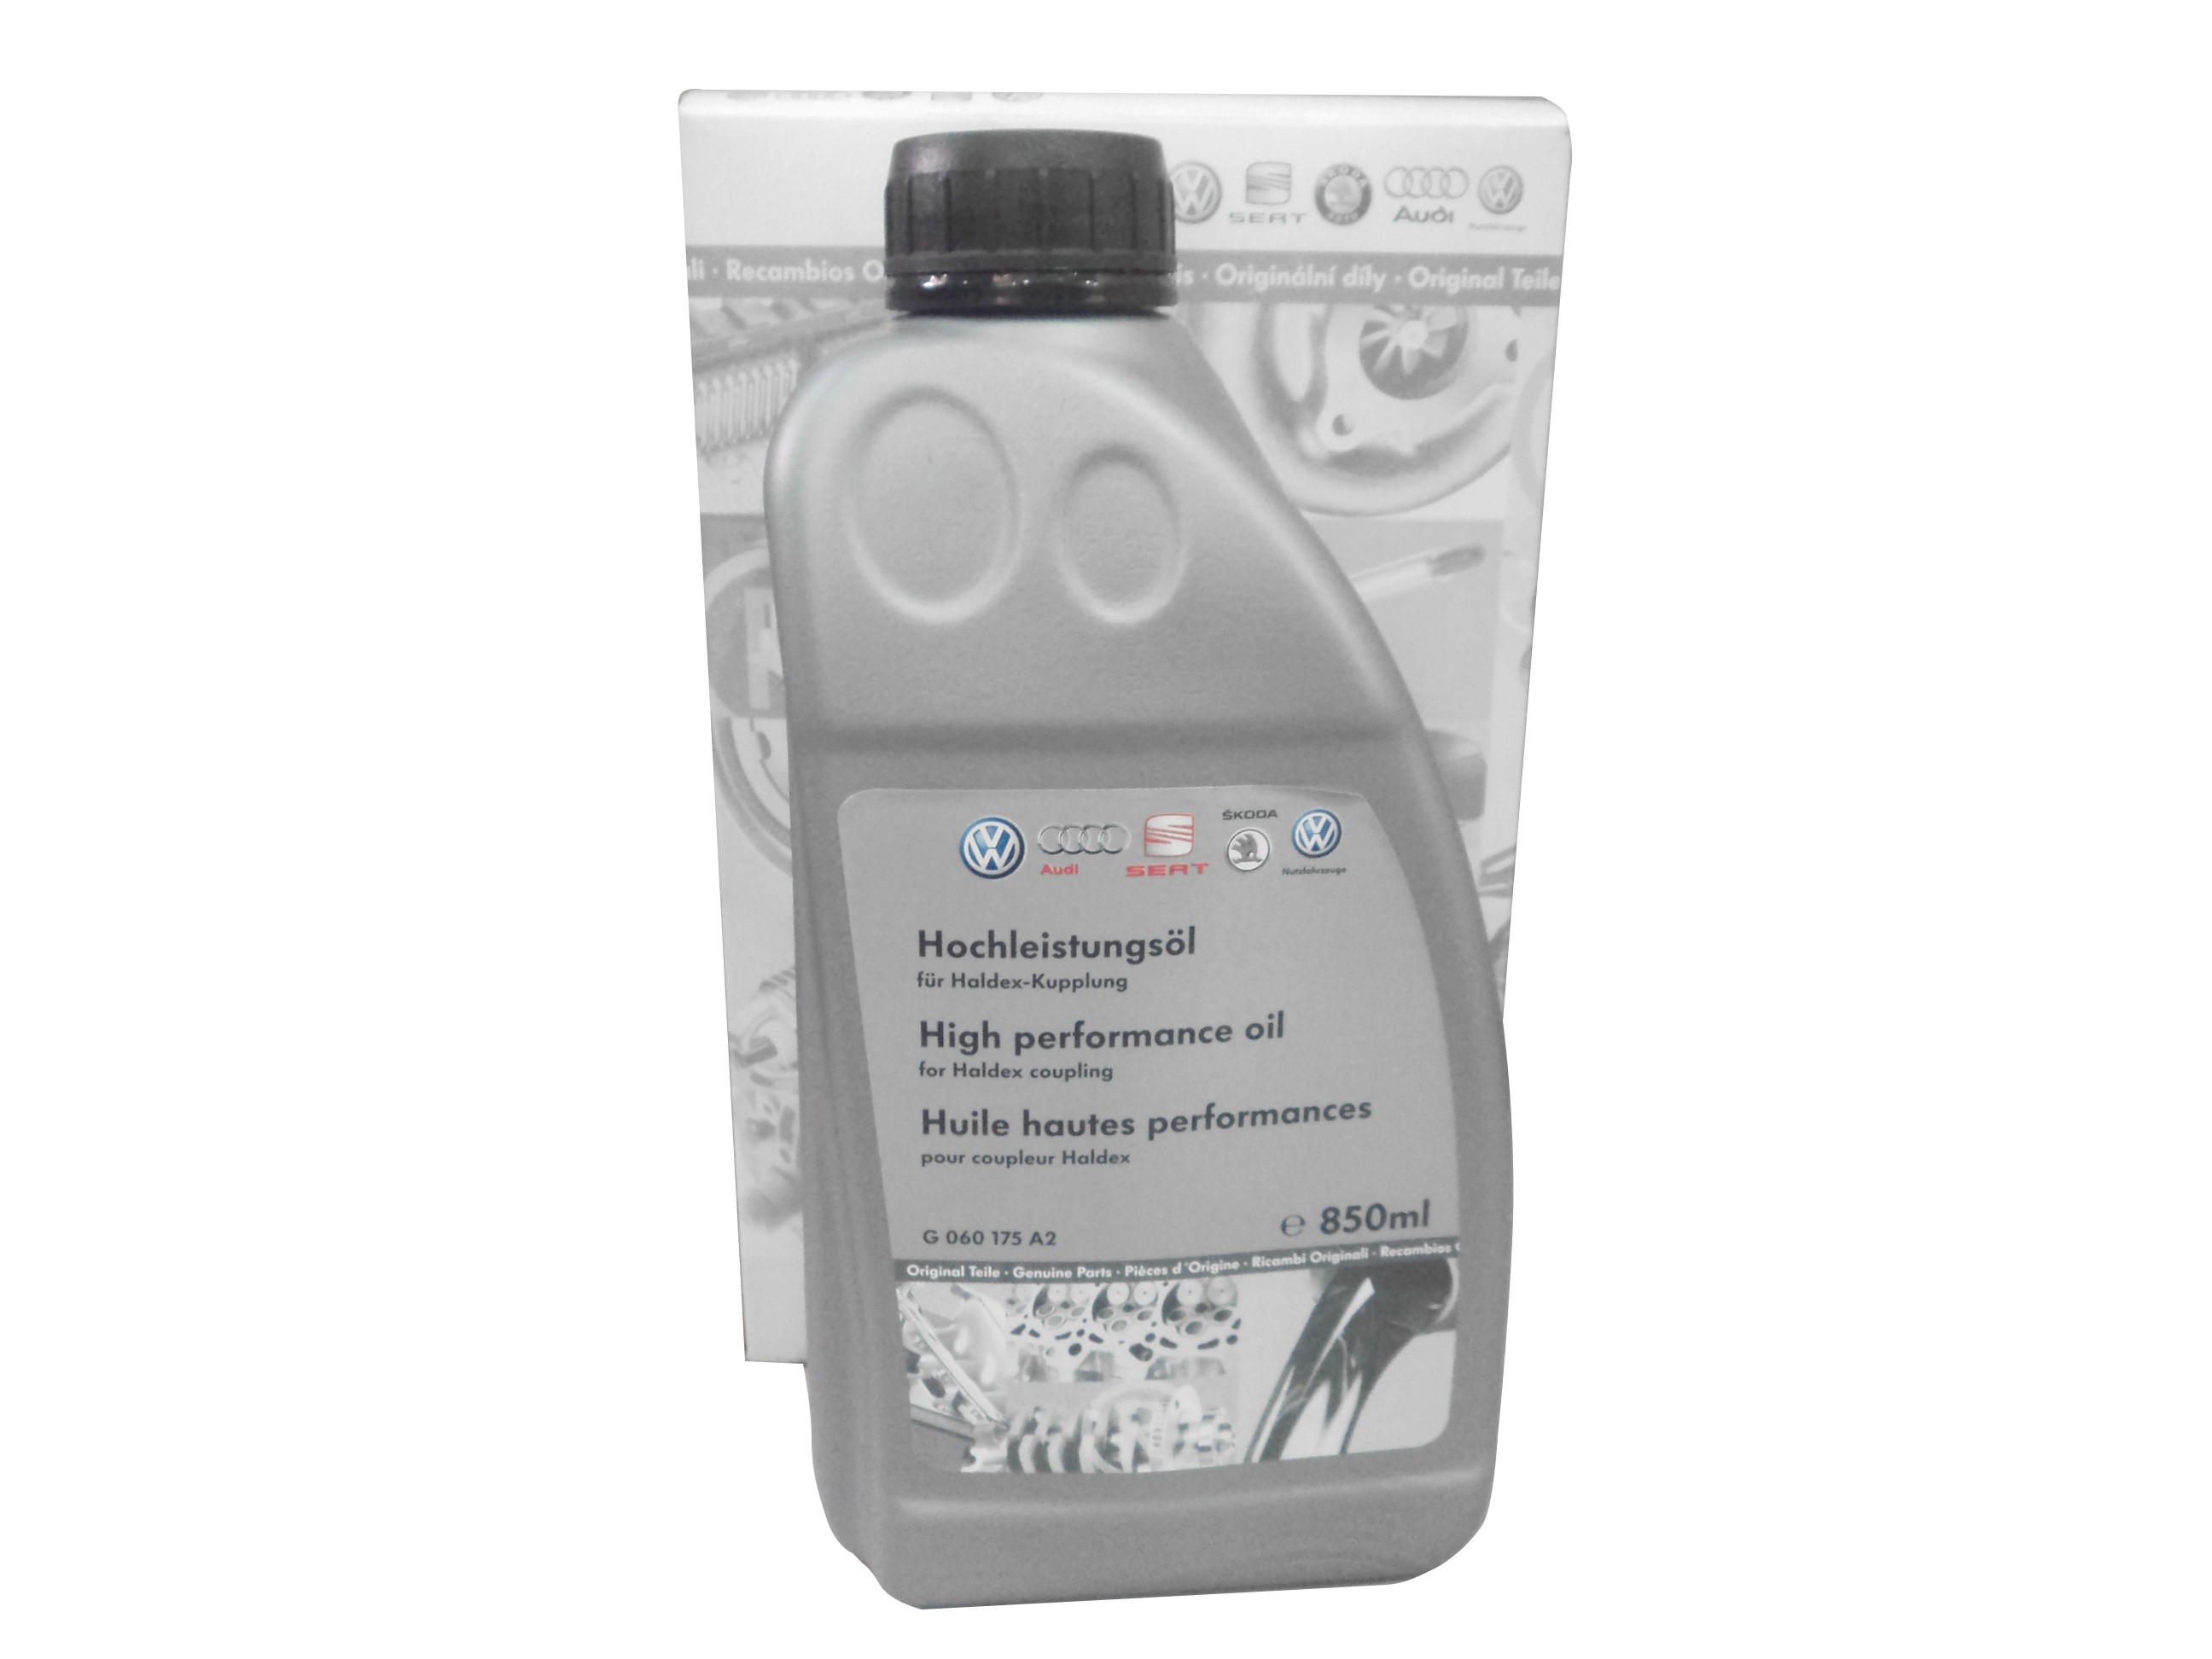 g060175a2-oleo-alta-performace-haldex.jpg